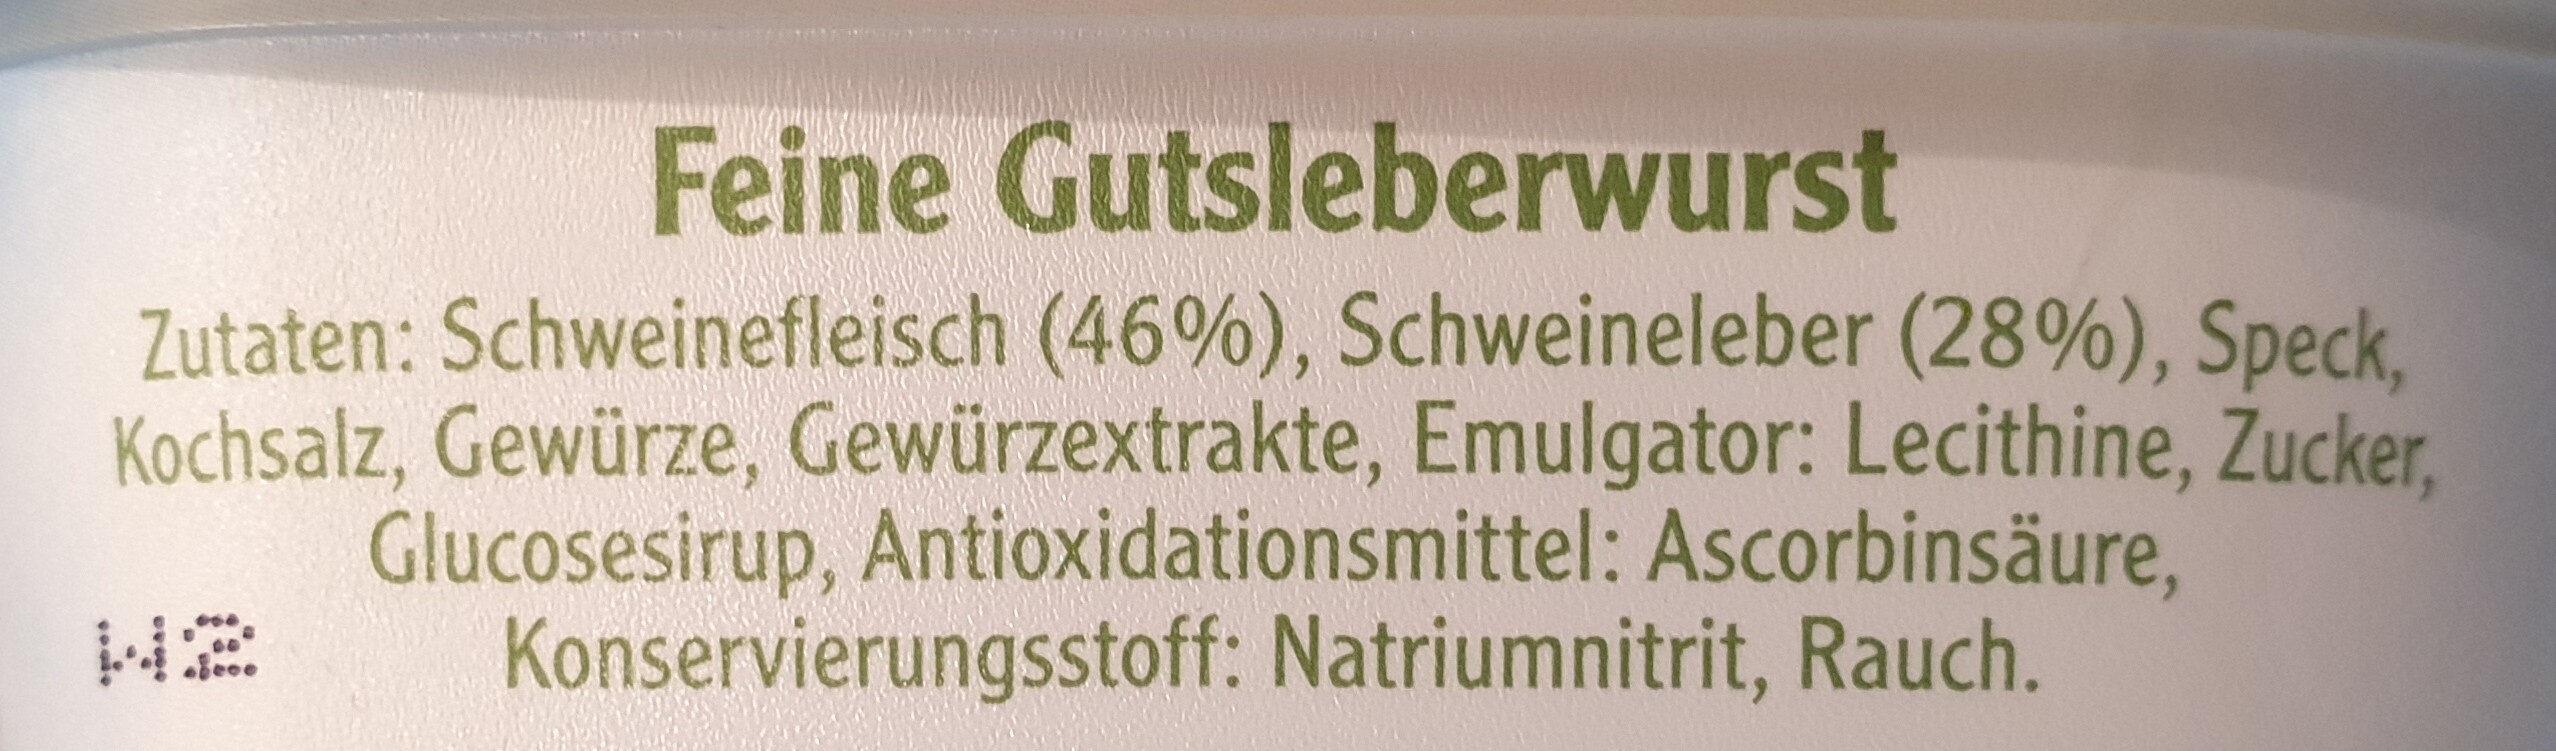 Pommersche Leberwurst - Ingrediënten - de